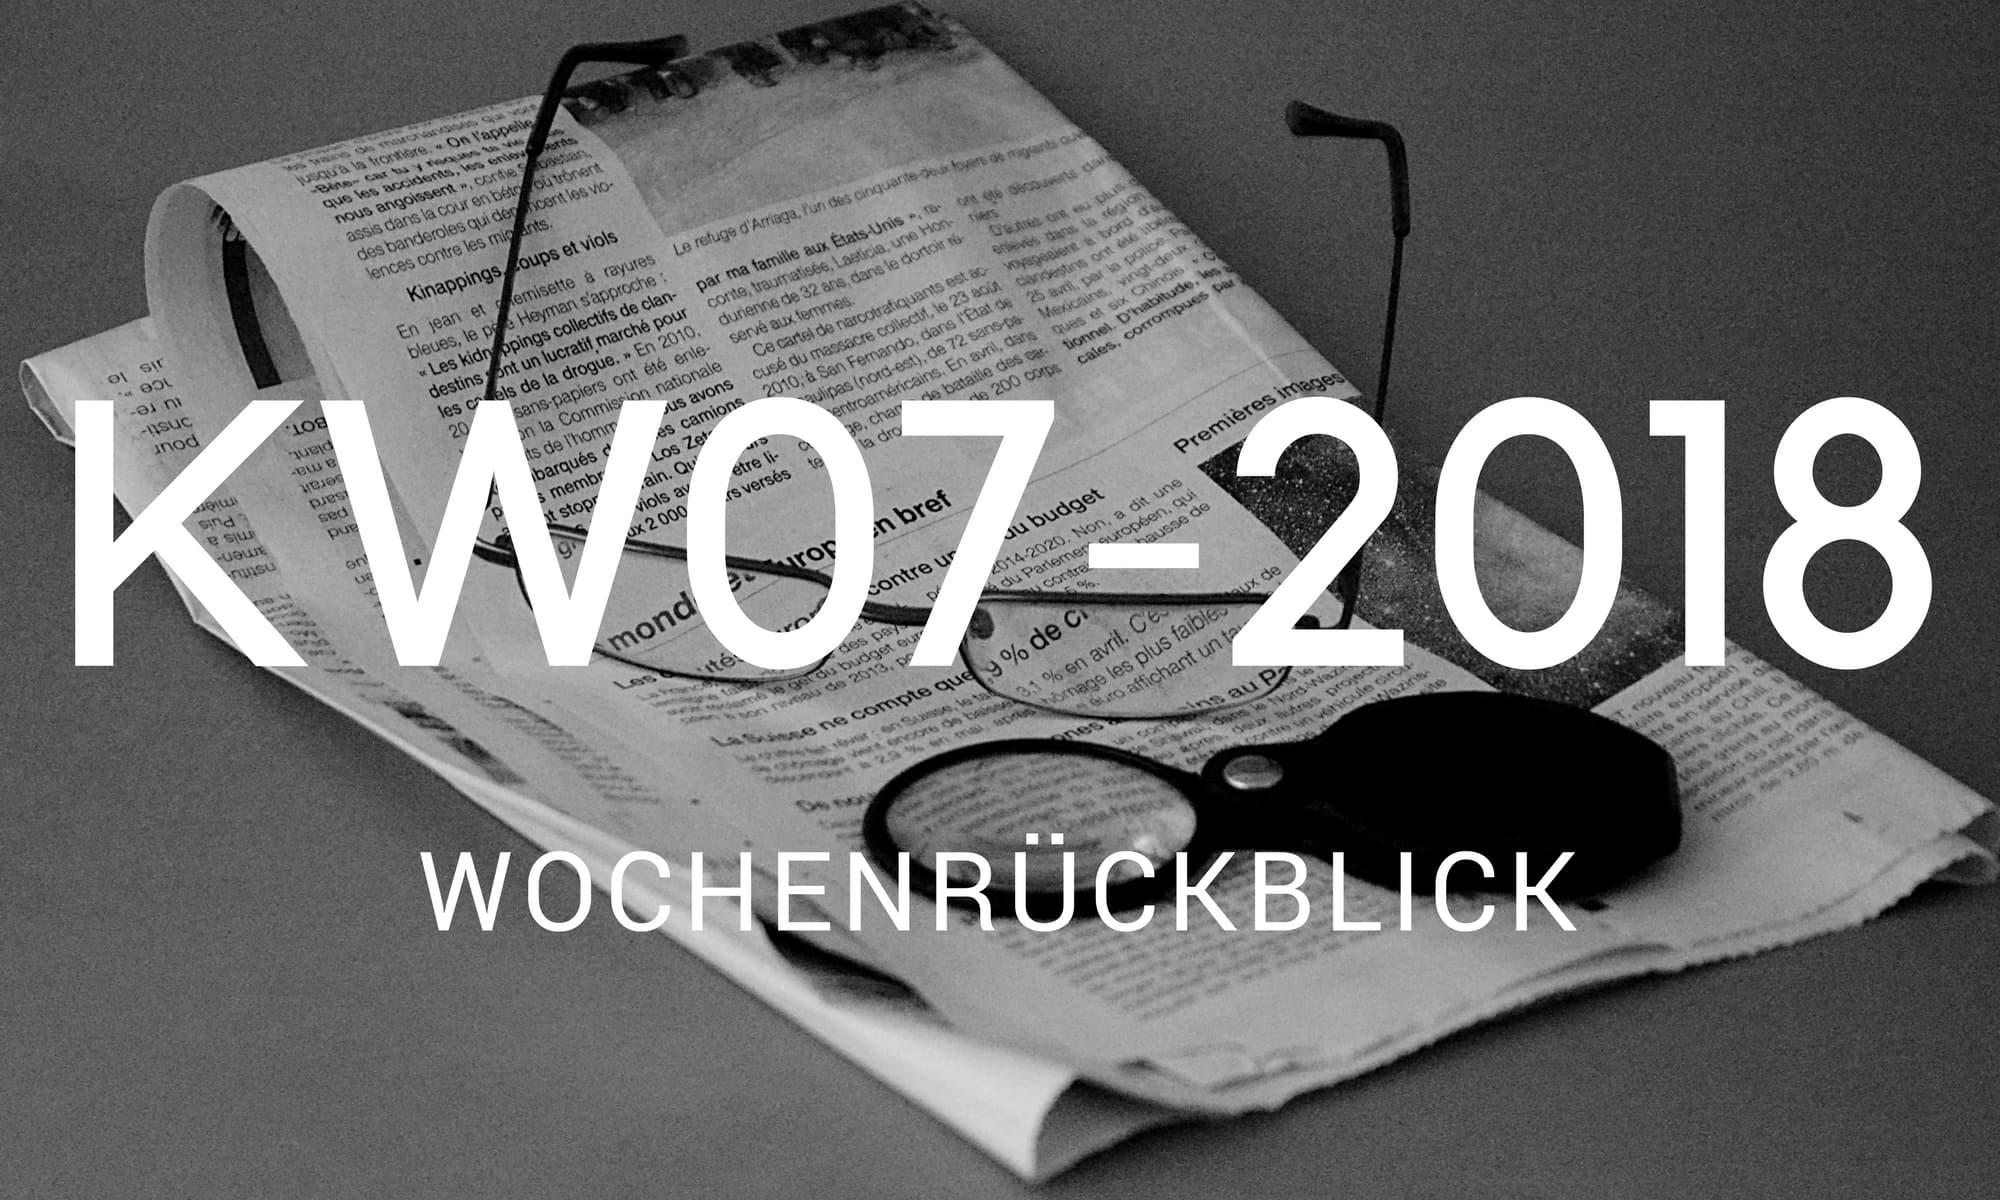 wochenrueckblick camping news KW07 2018